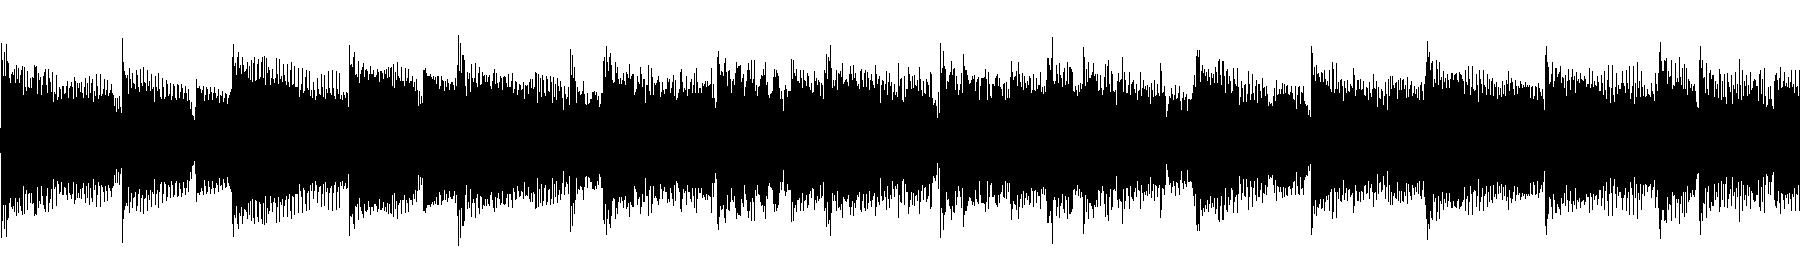 guitarblues14 130